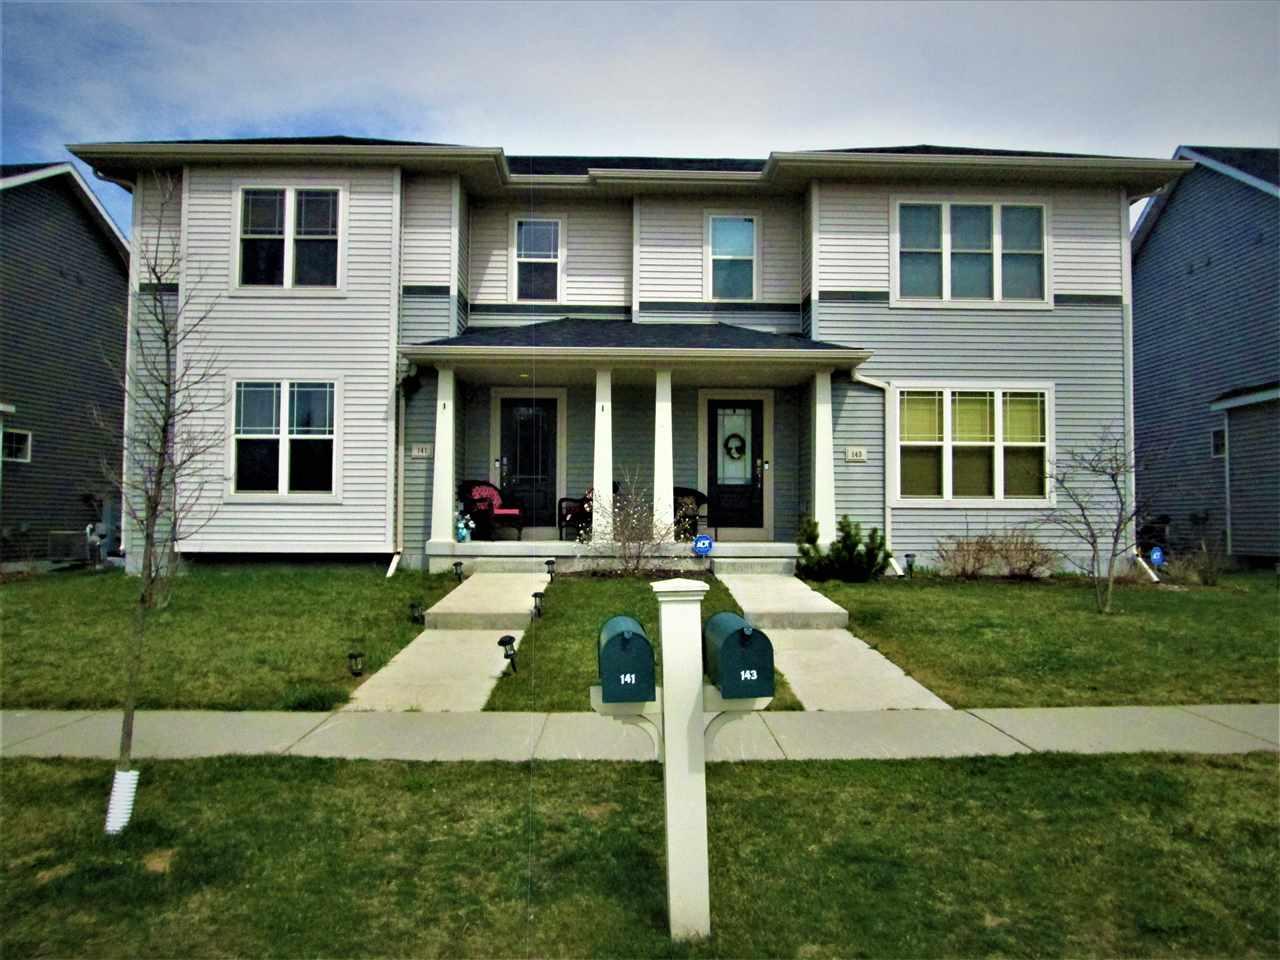 141 Milky Way, MADISON, Wisconsin 53718-2945, 3 Bedrooms Bedrooms, ,4 BathroomsBathrooms,Single Family,For Sale,141 Milky Way,2,1905836